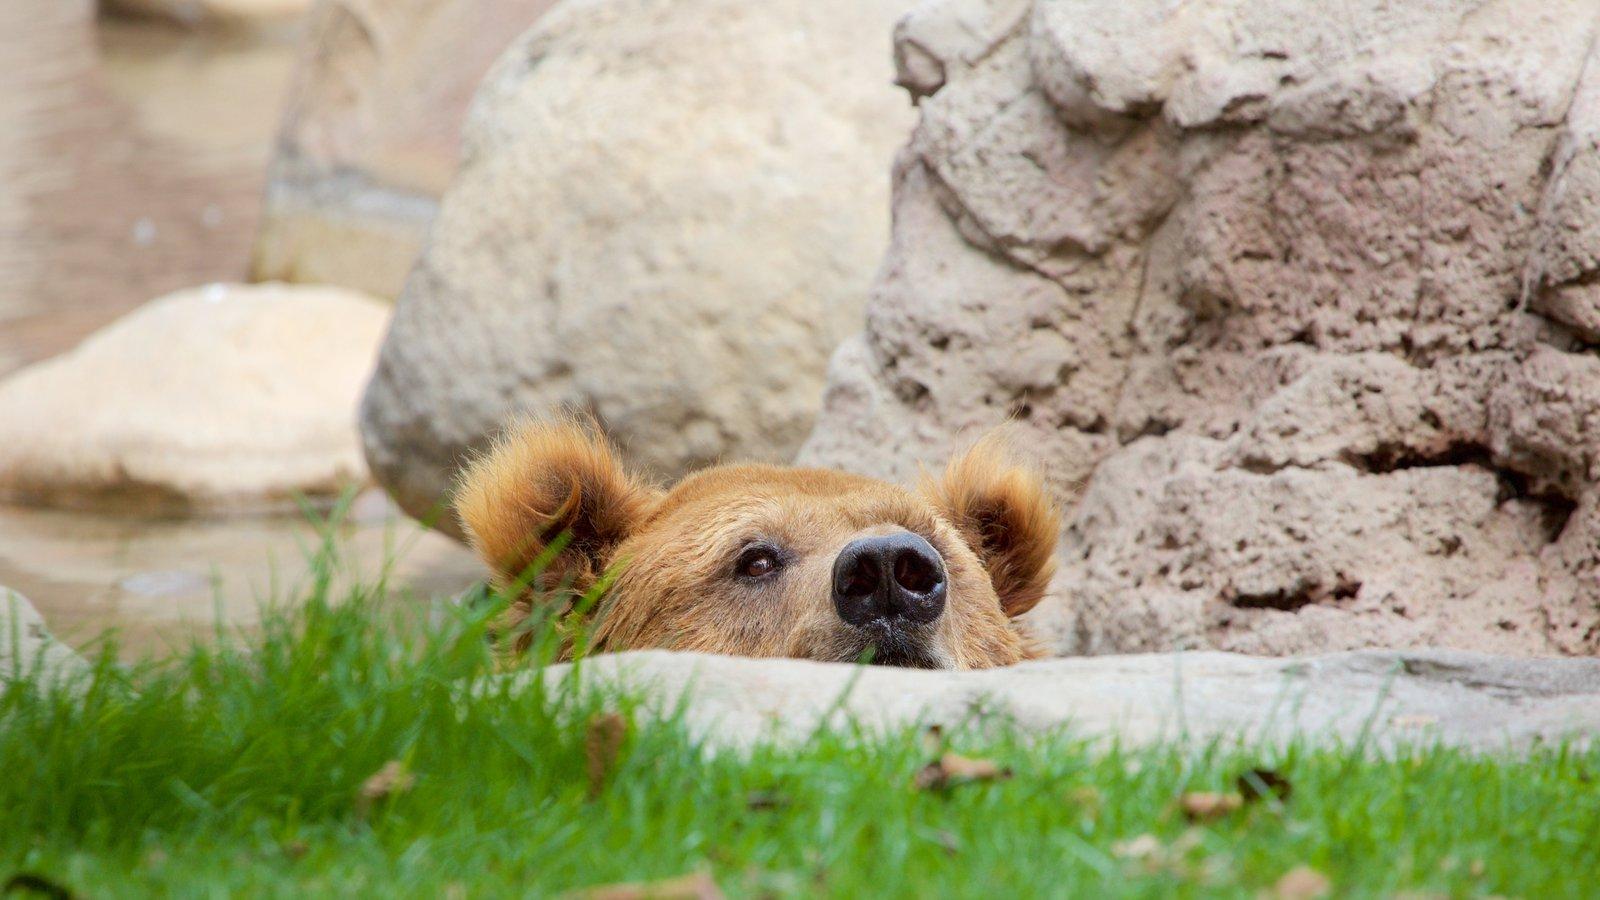 Parque Zoologico de Chapultepec showing dangerous animals and zoo animals